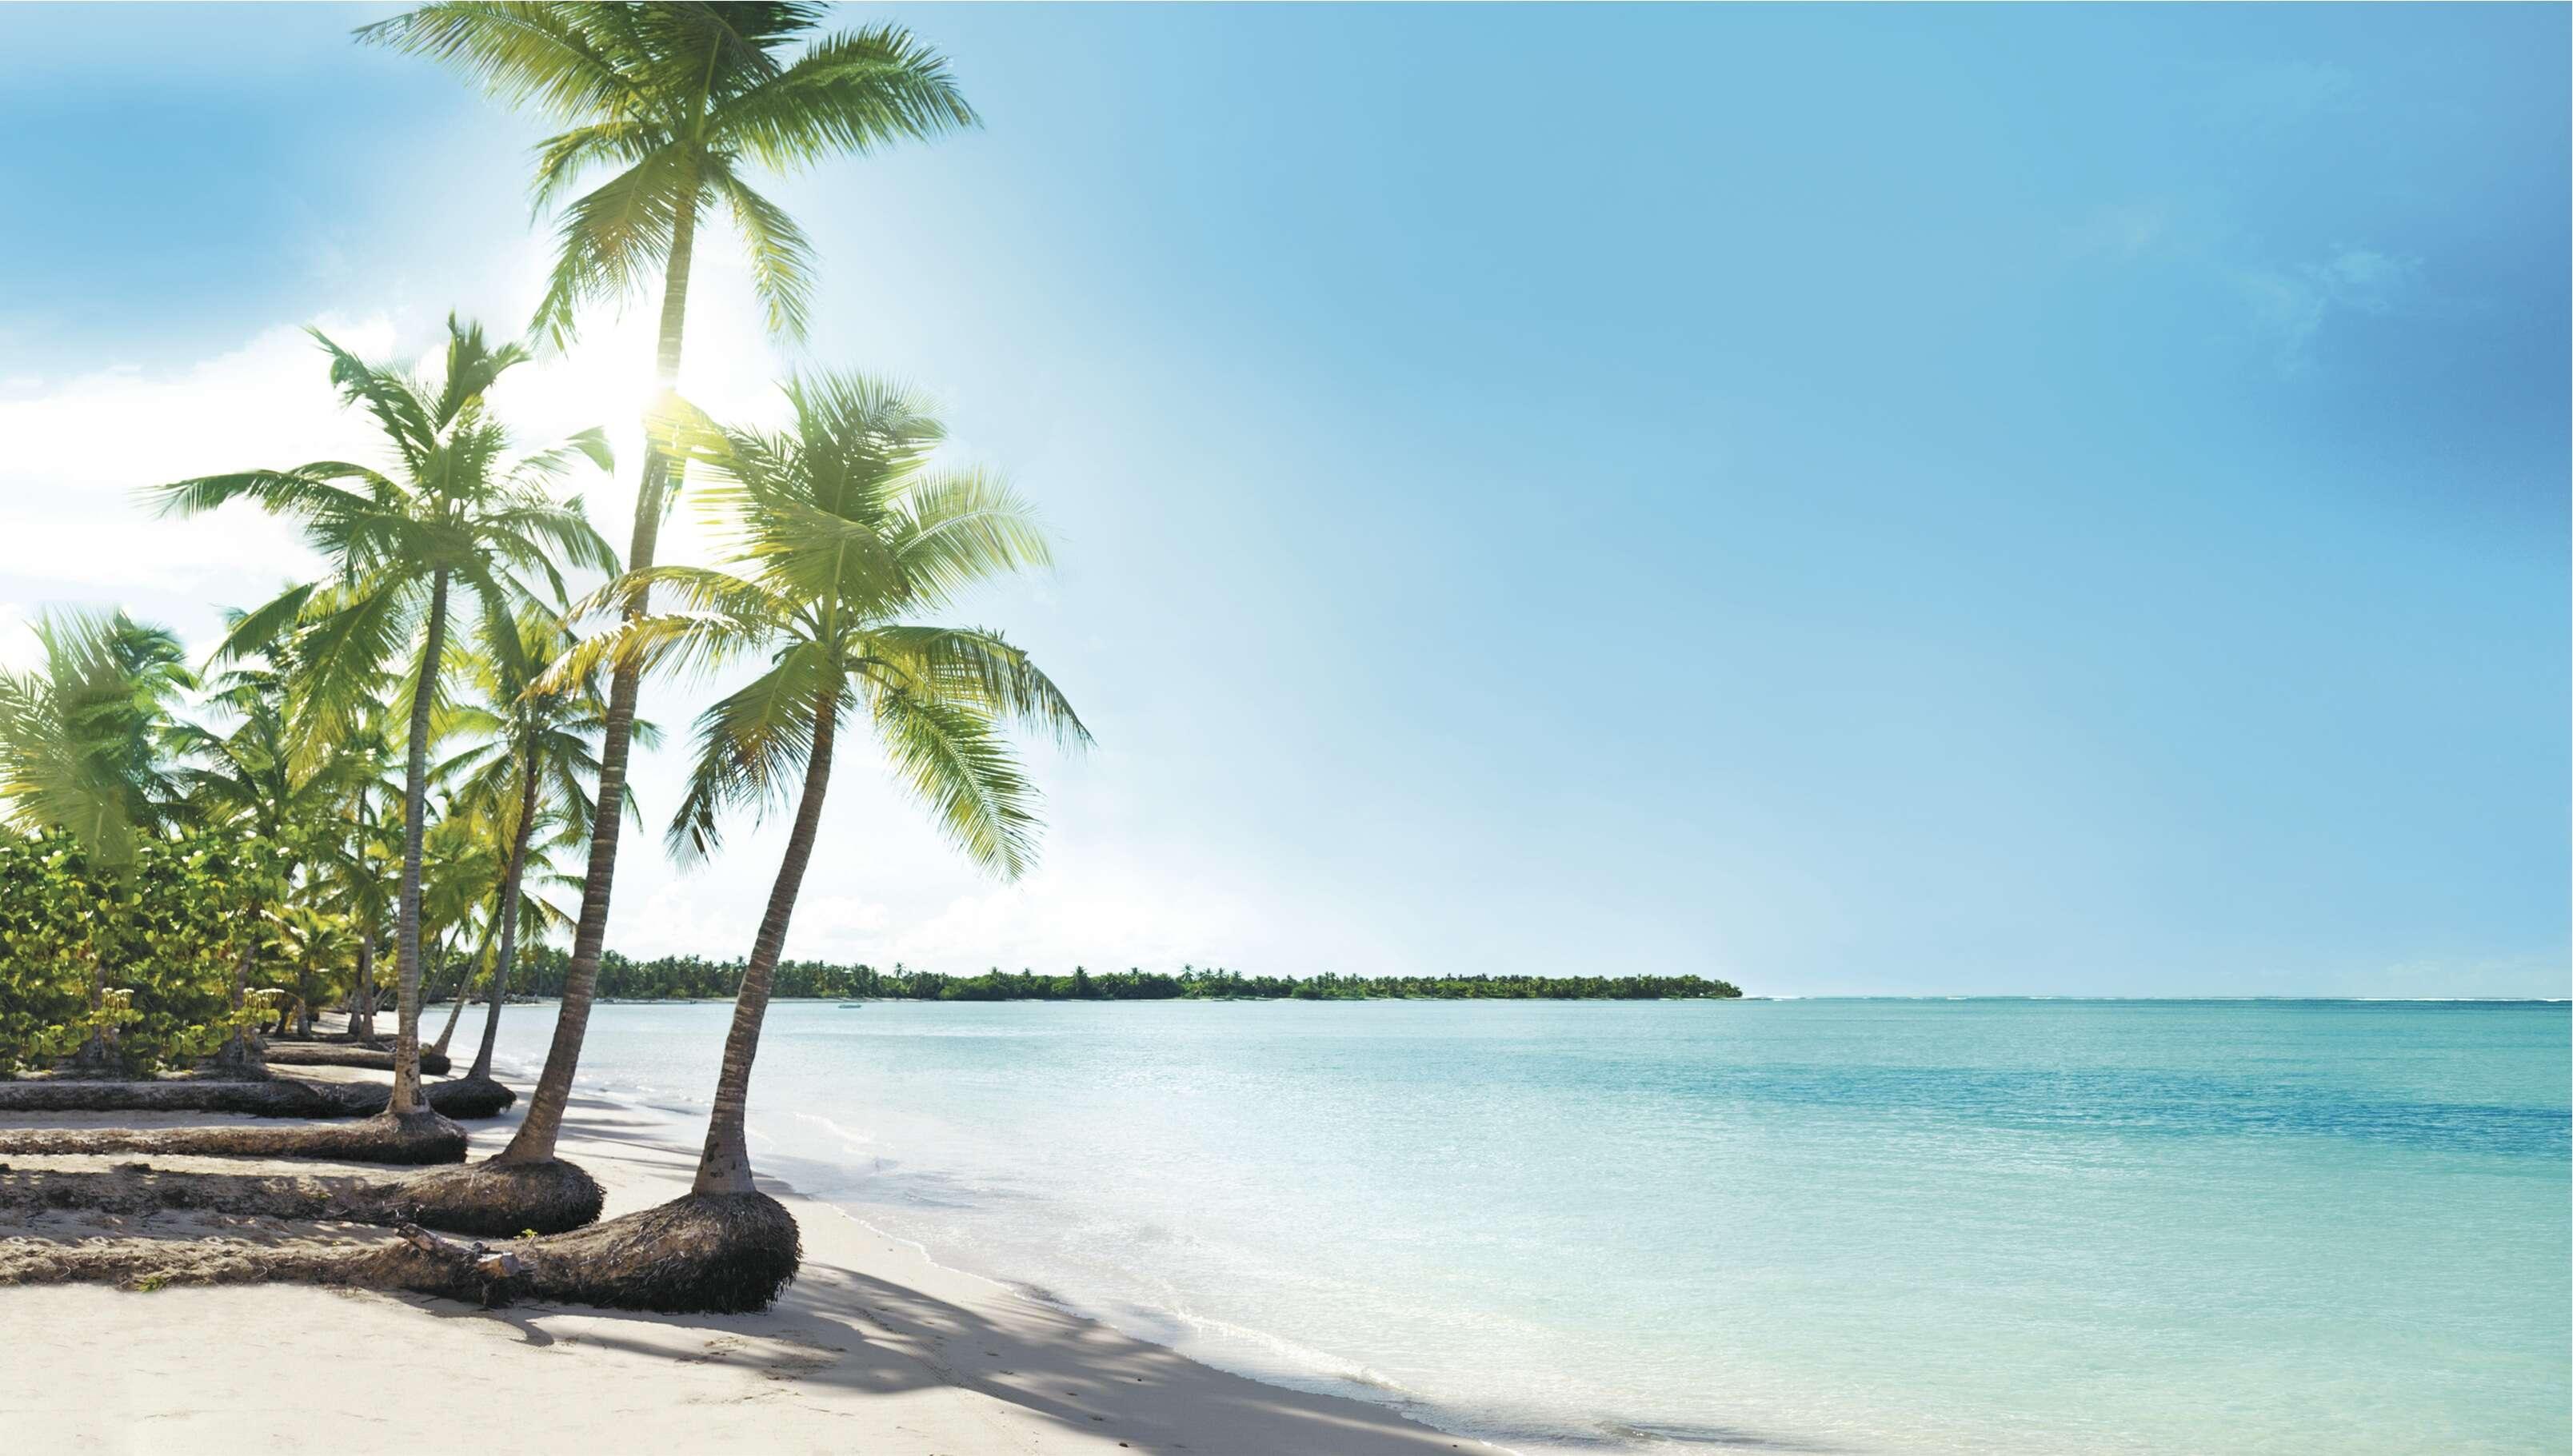 Air Canada Vacations - Receive a $300 air credit!